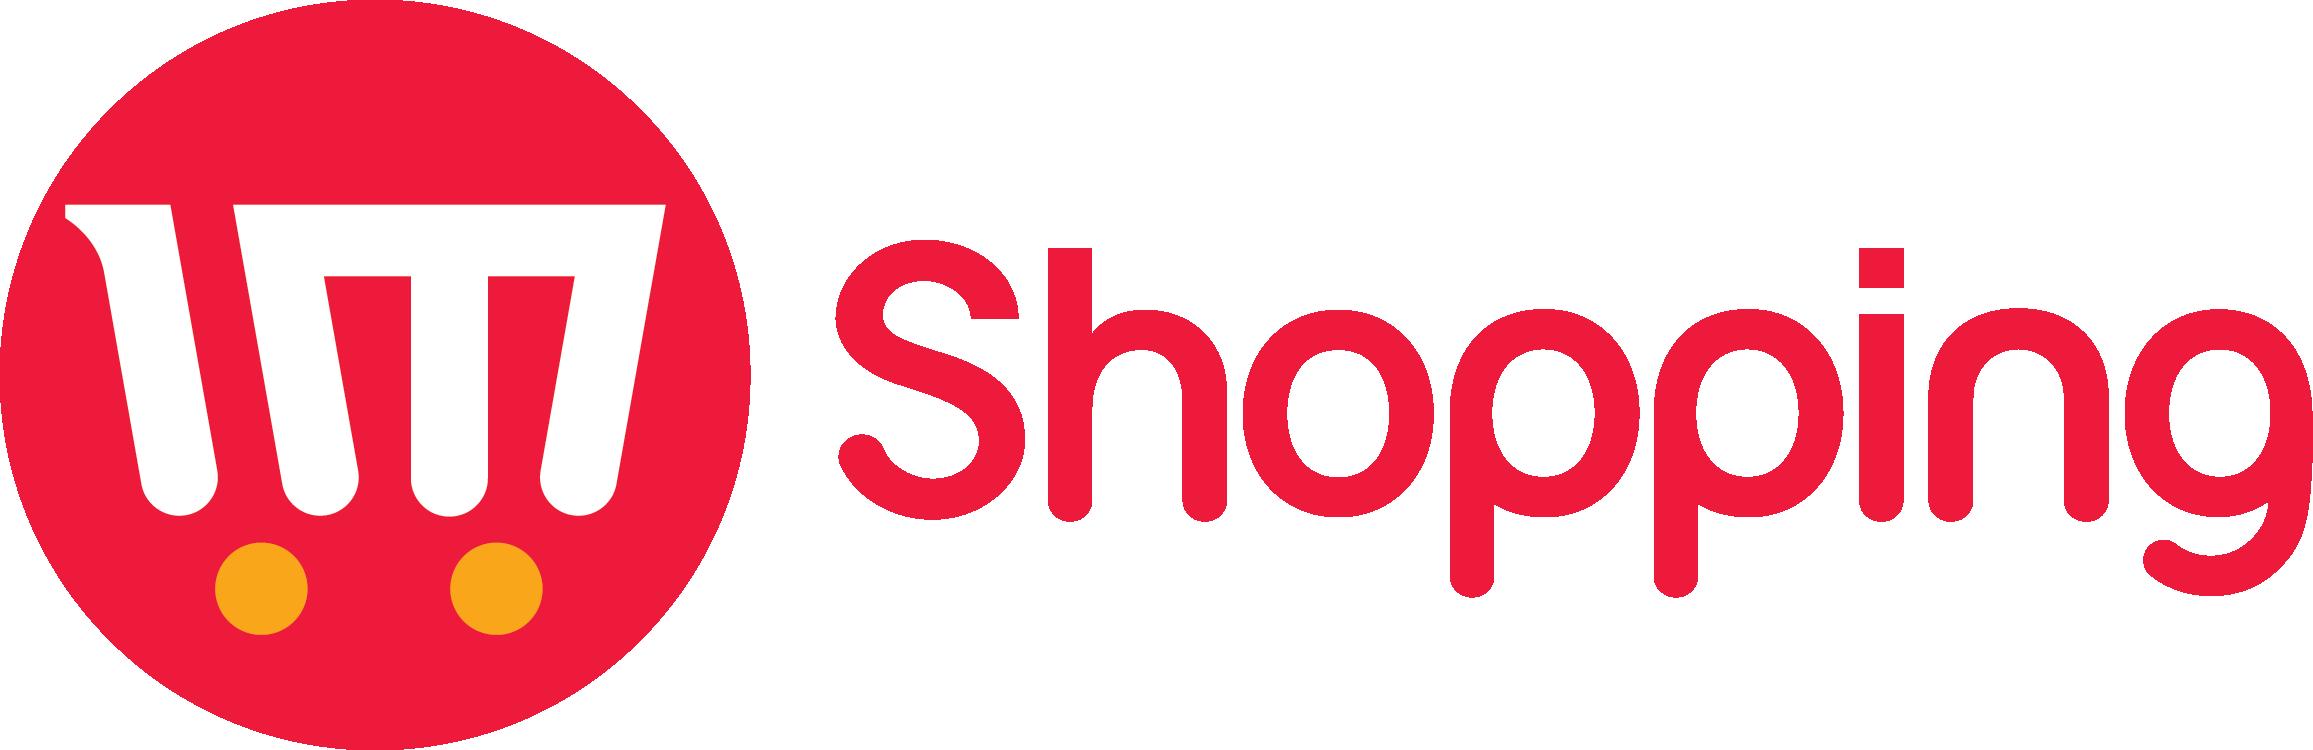 Public Homeshopping Co LTD